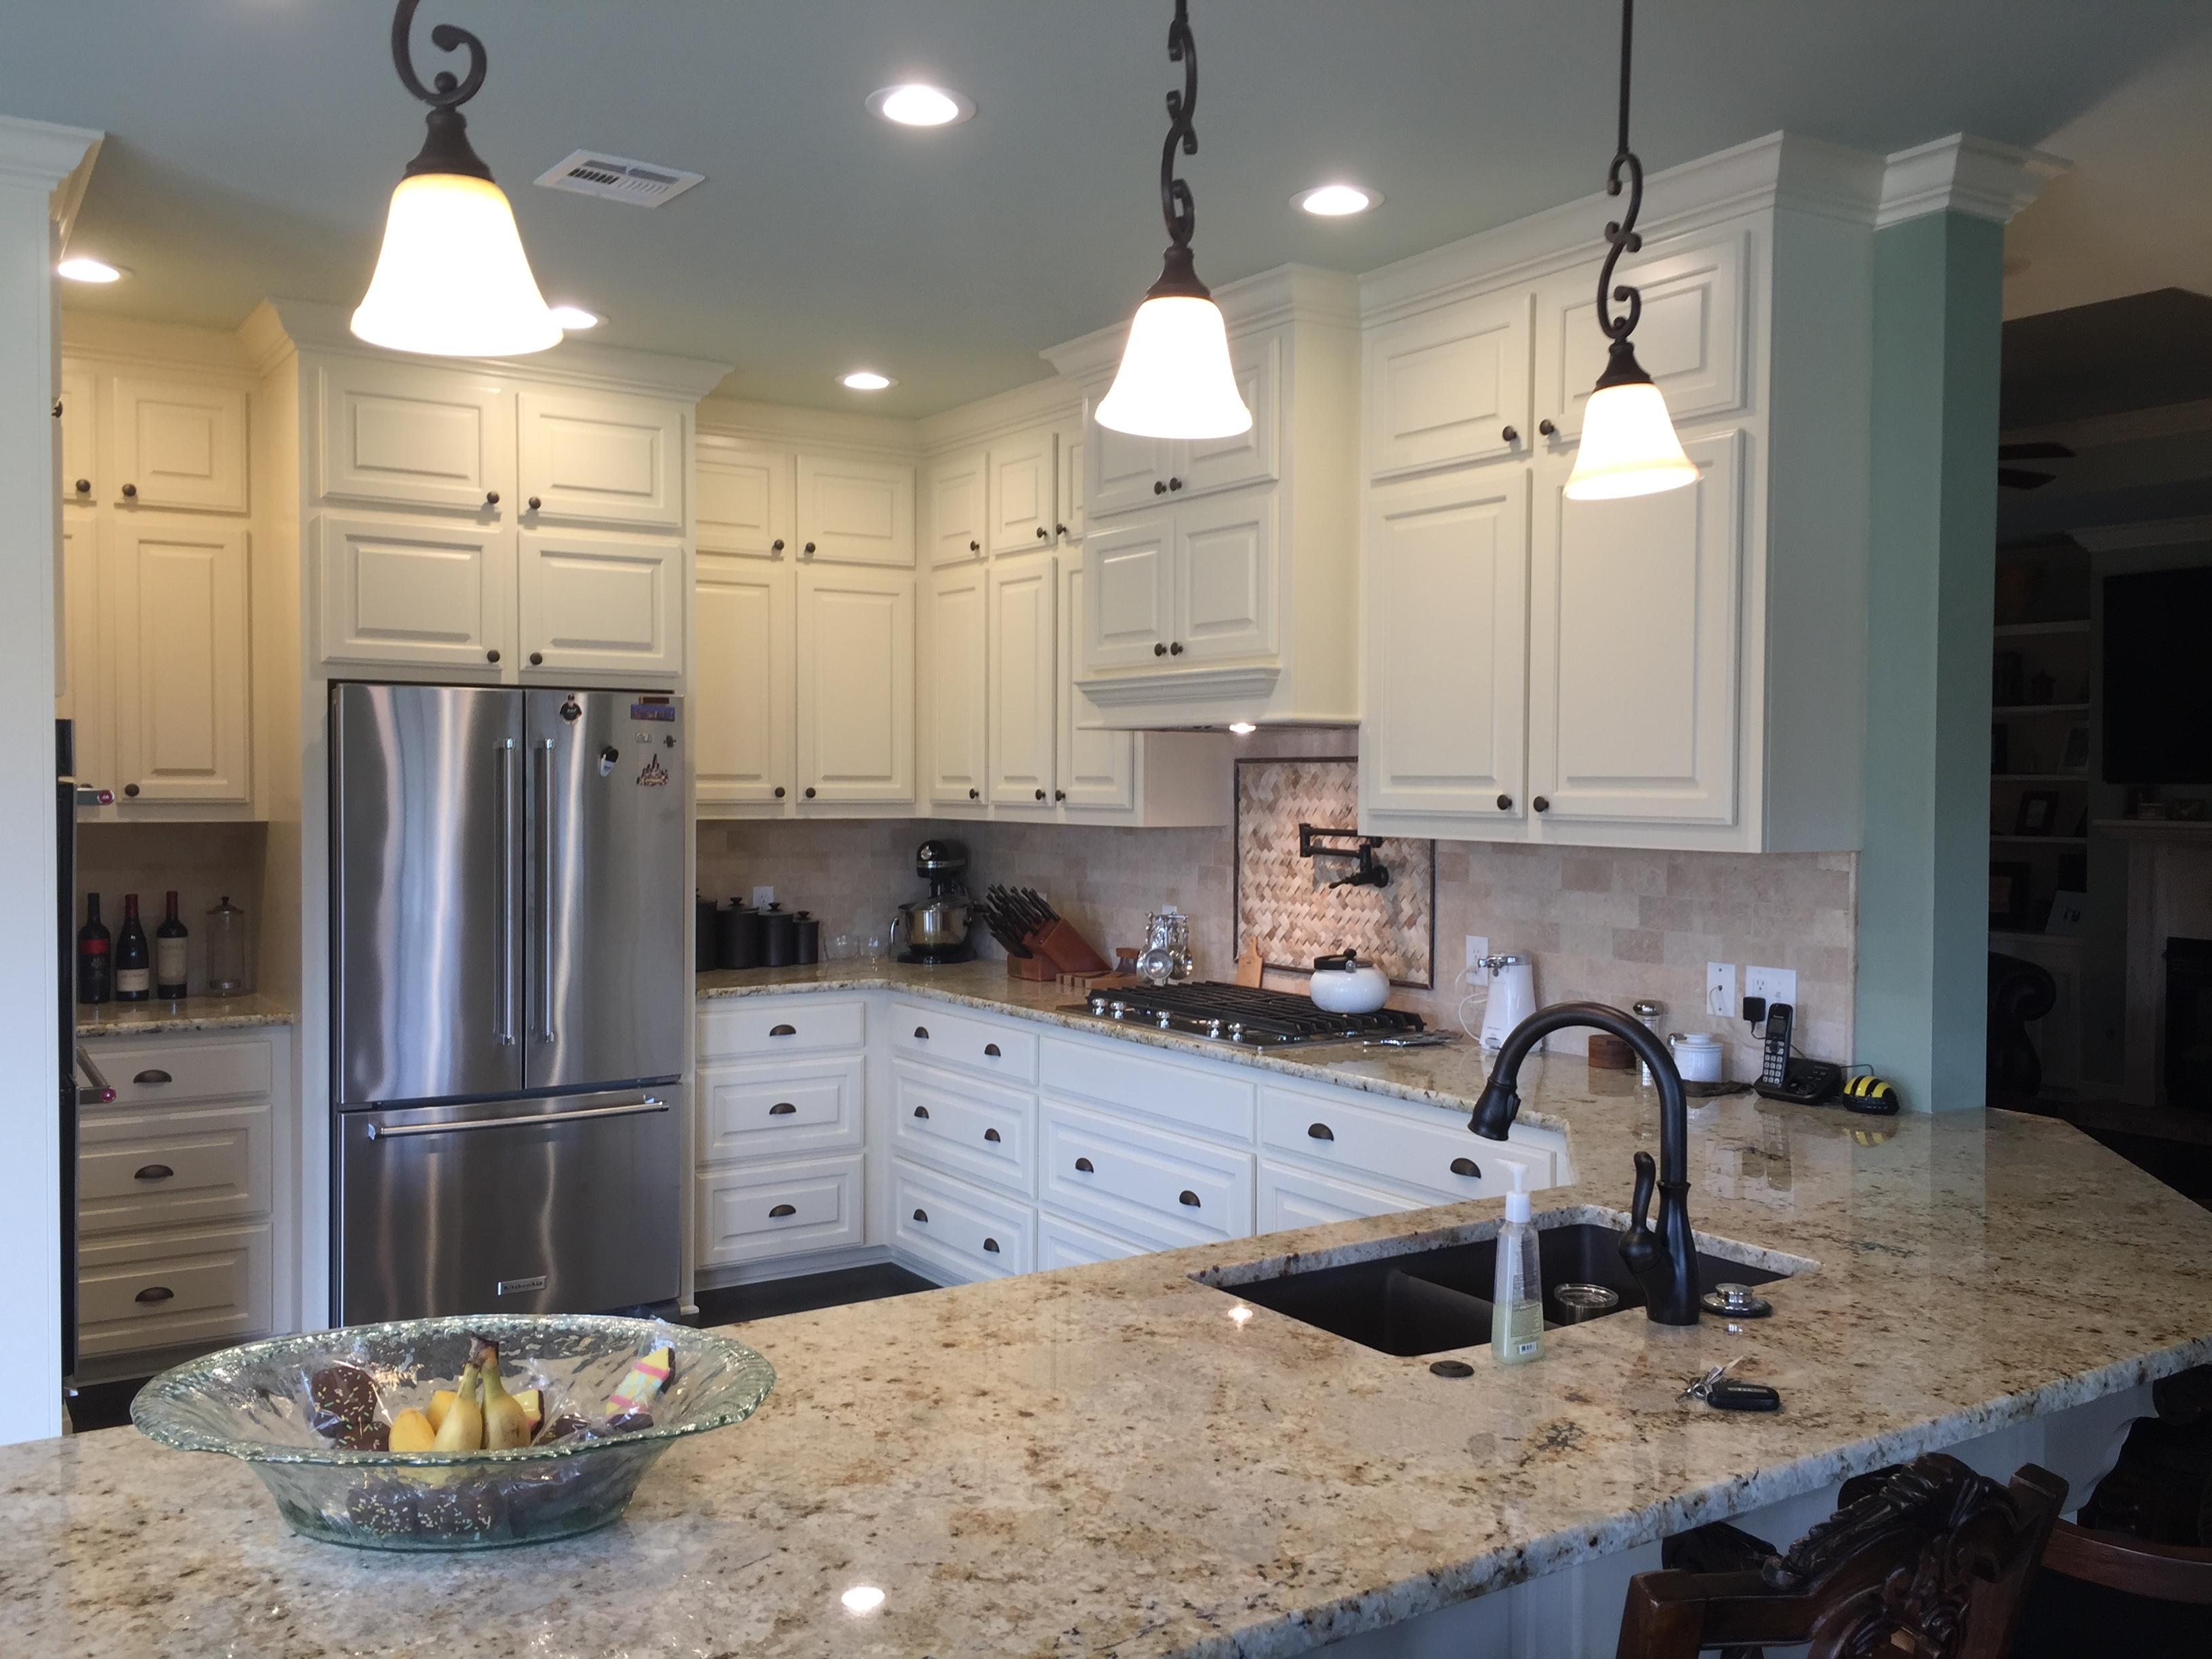 Showcase Homes & Remodeling LLC image 10